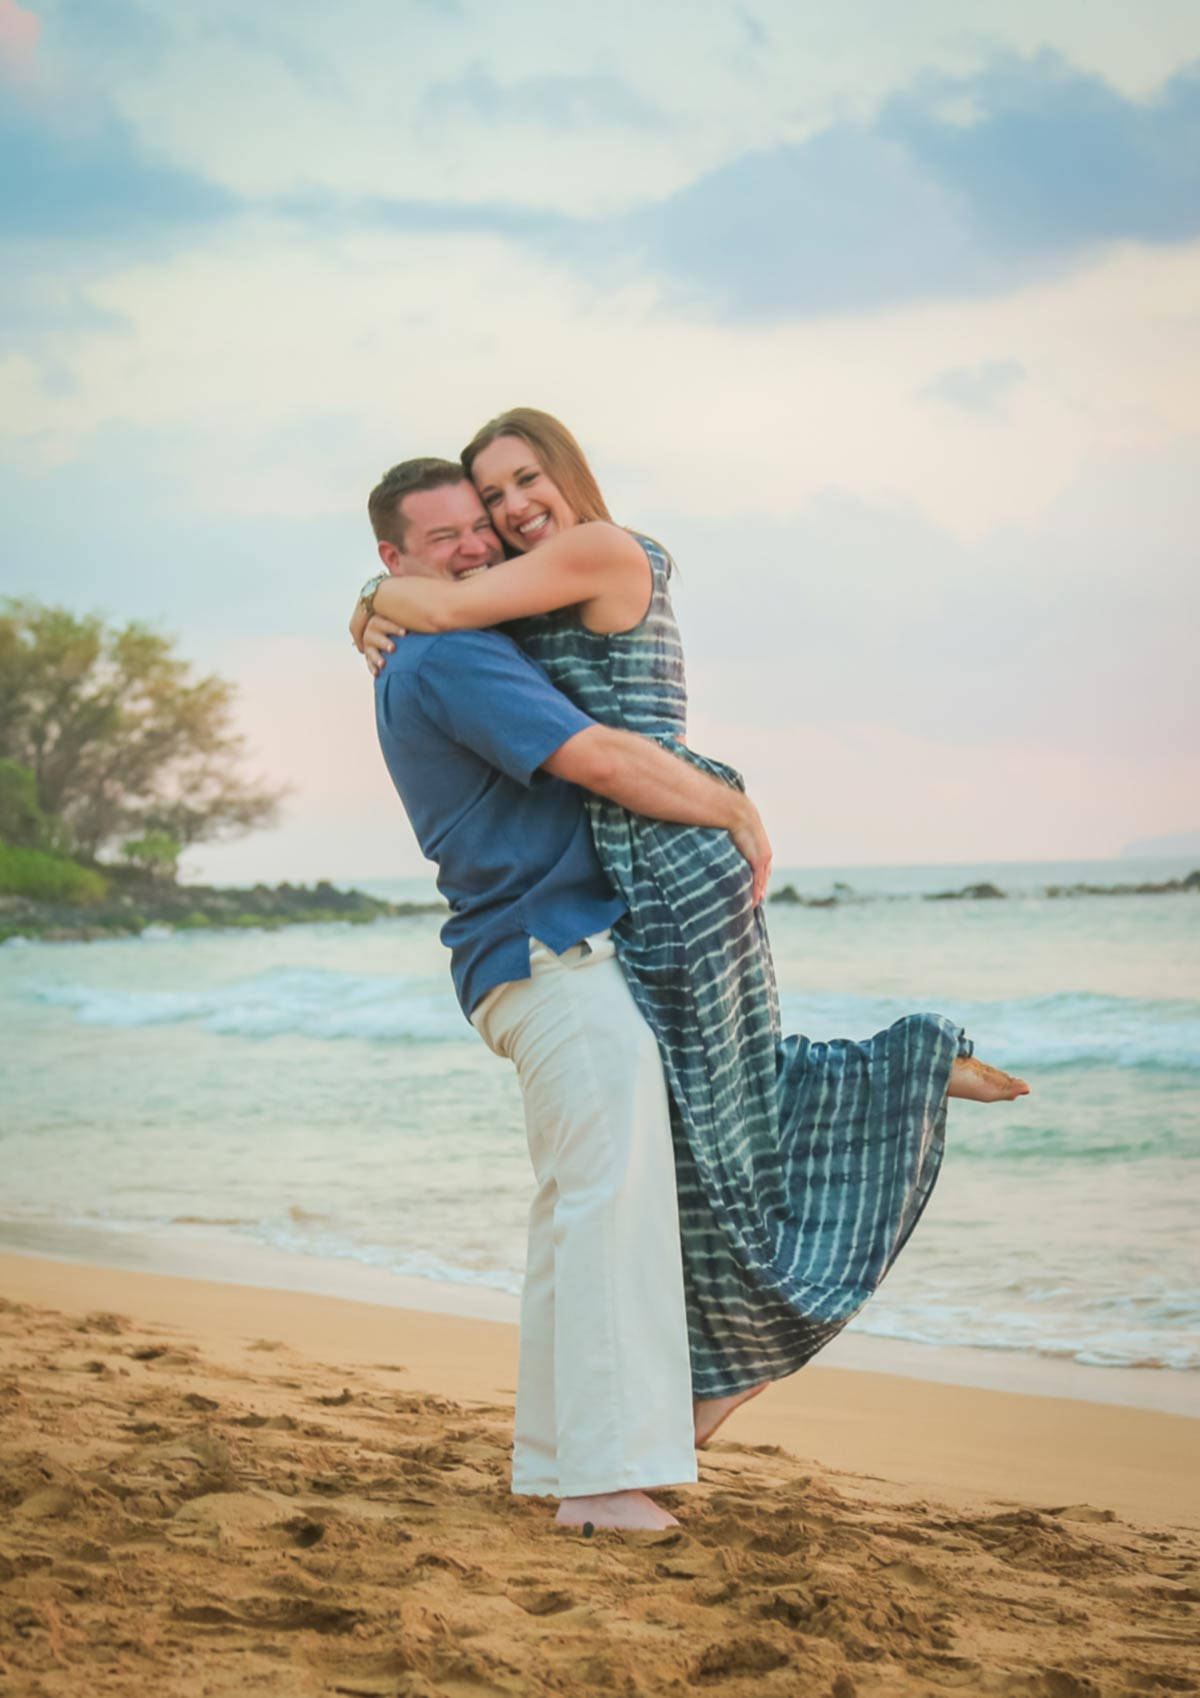 Romantic Couple Photography Session Maui